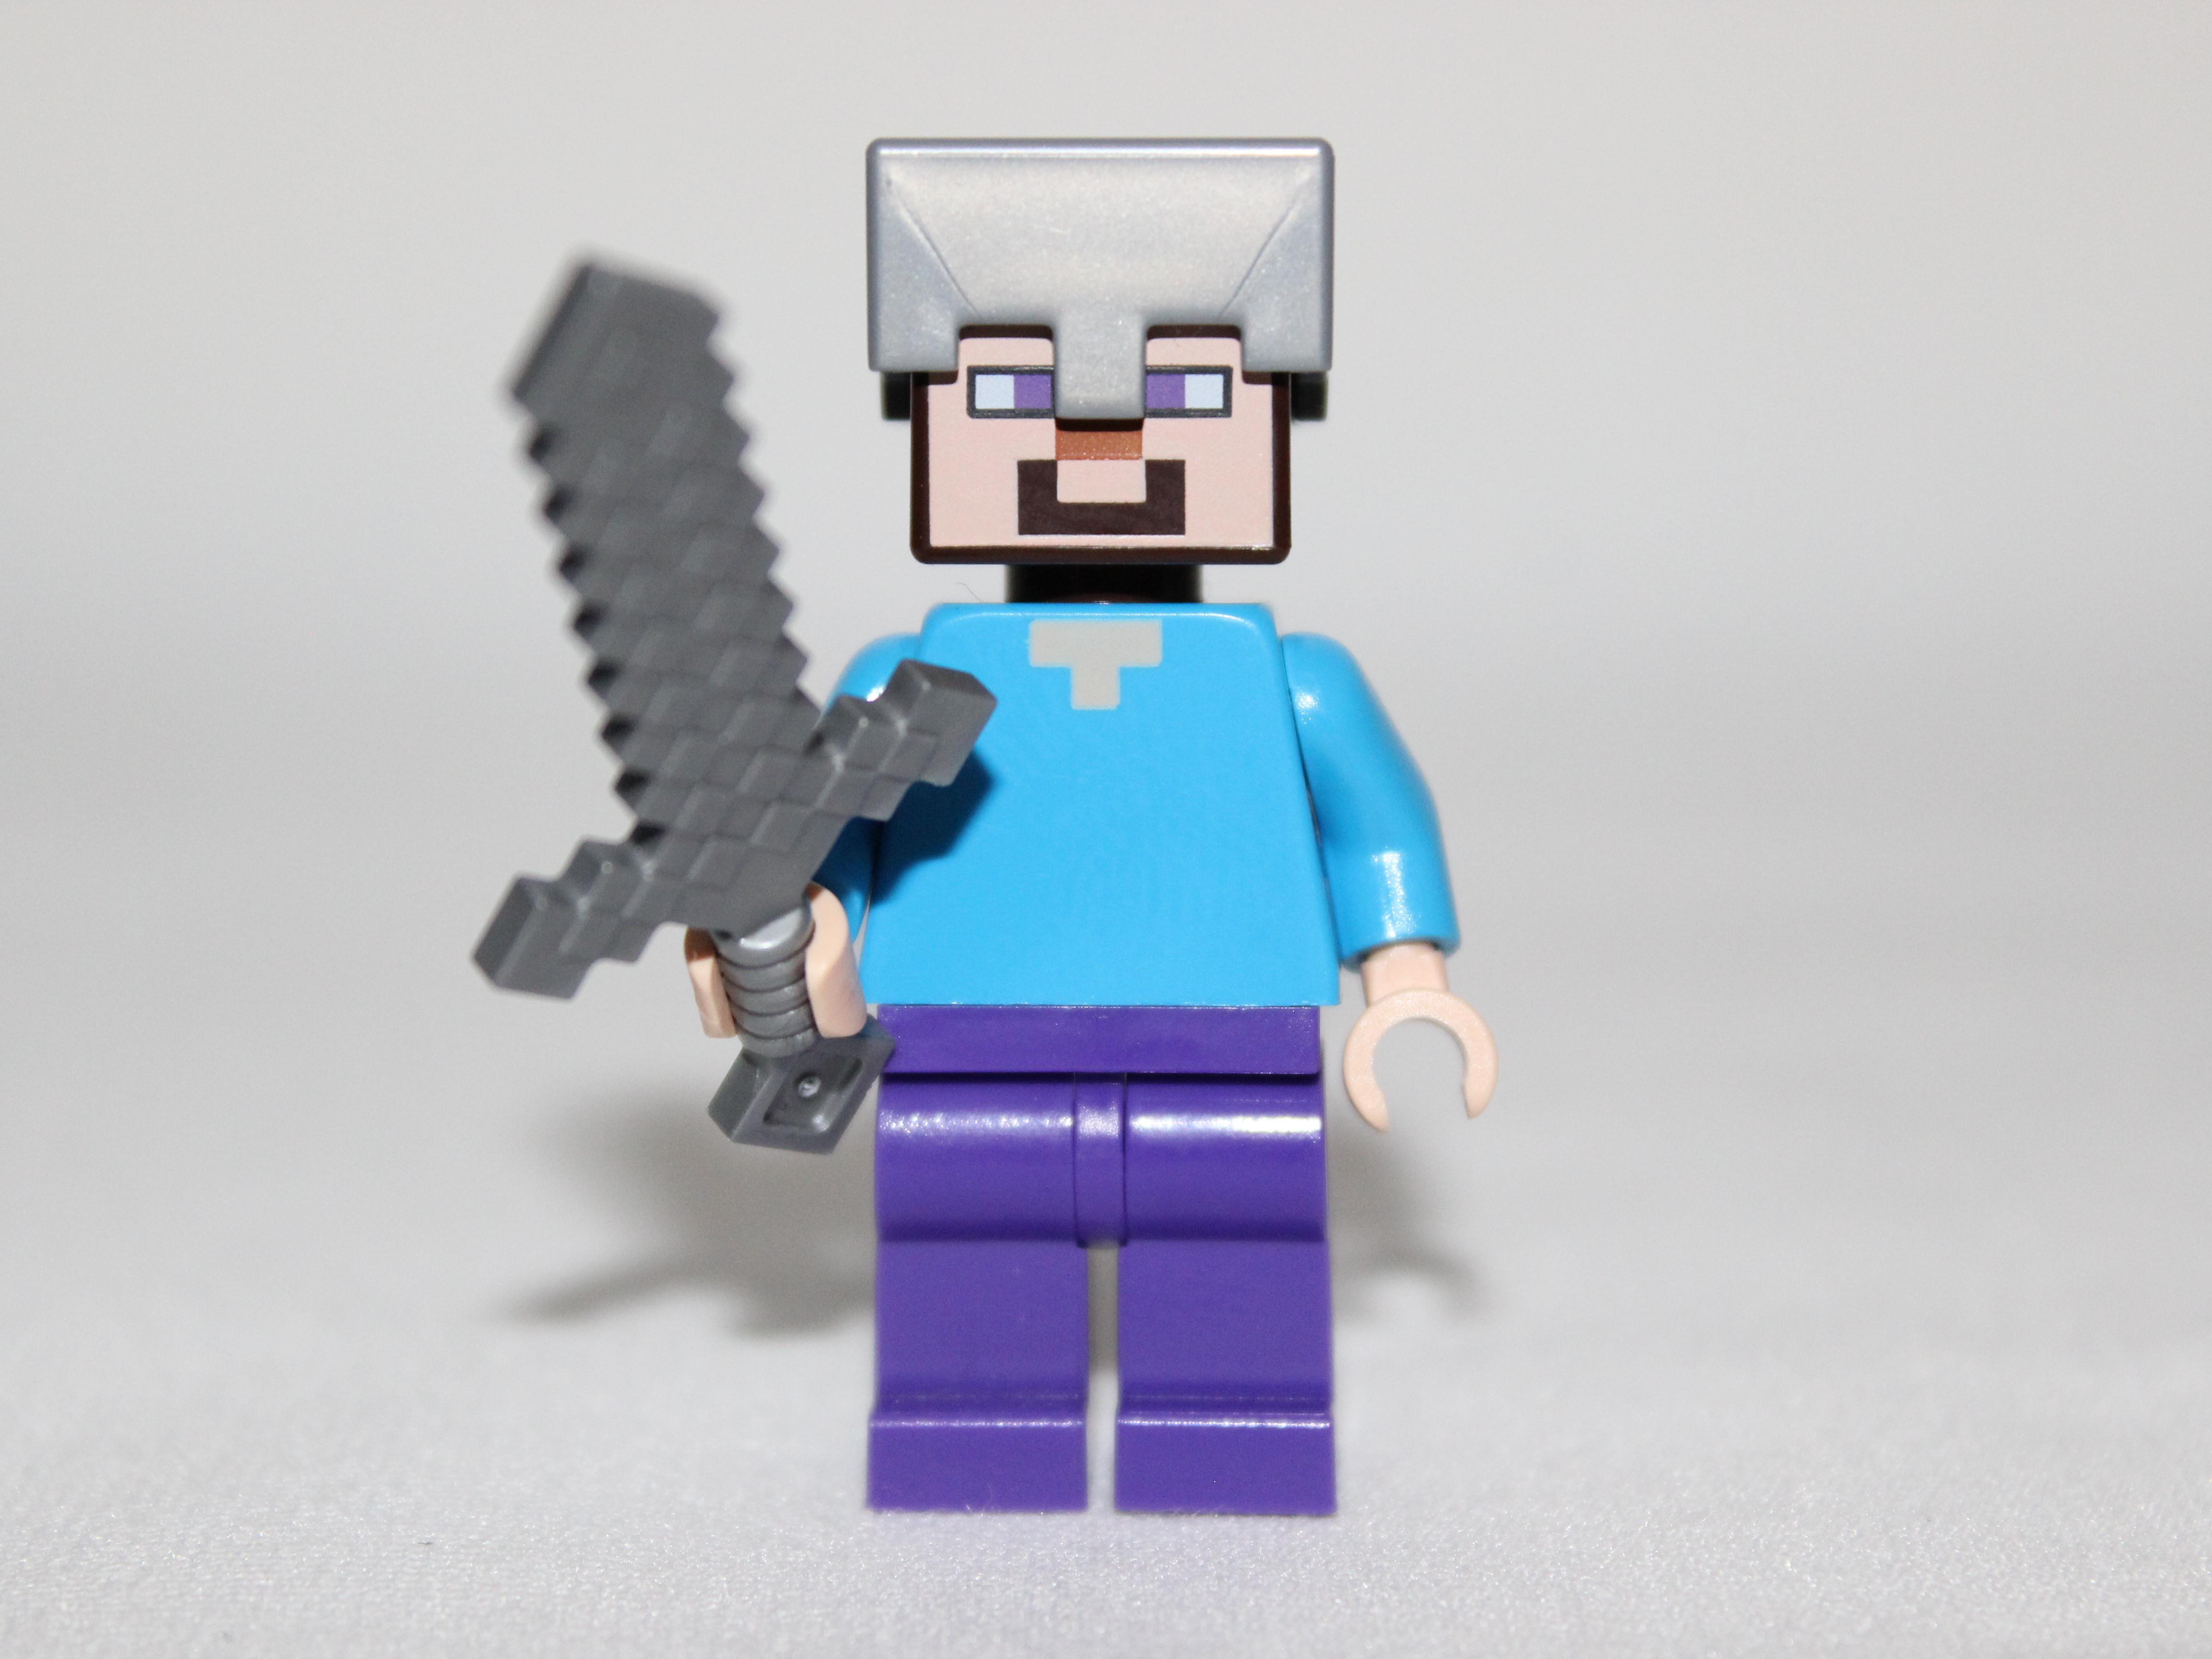 STEVE w// DIAMOND ARMOR//HELMET//PANTS PICKAXE//SWORD LEGO MINECRAFT